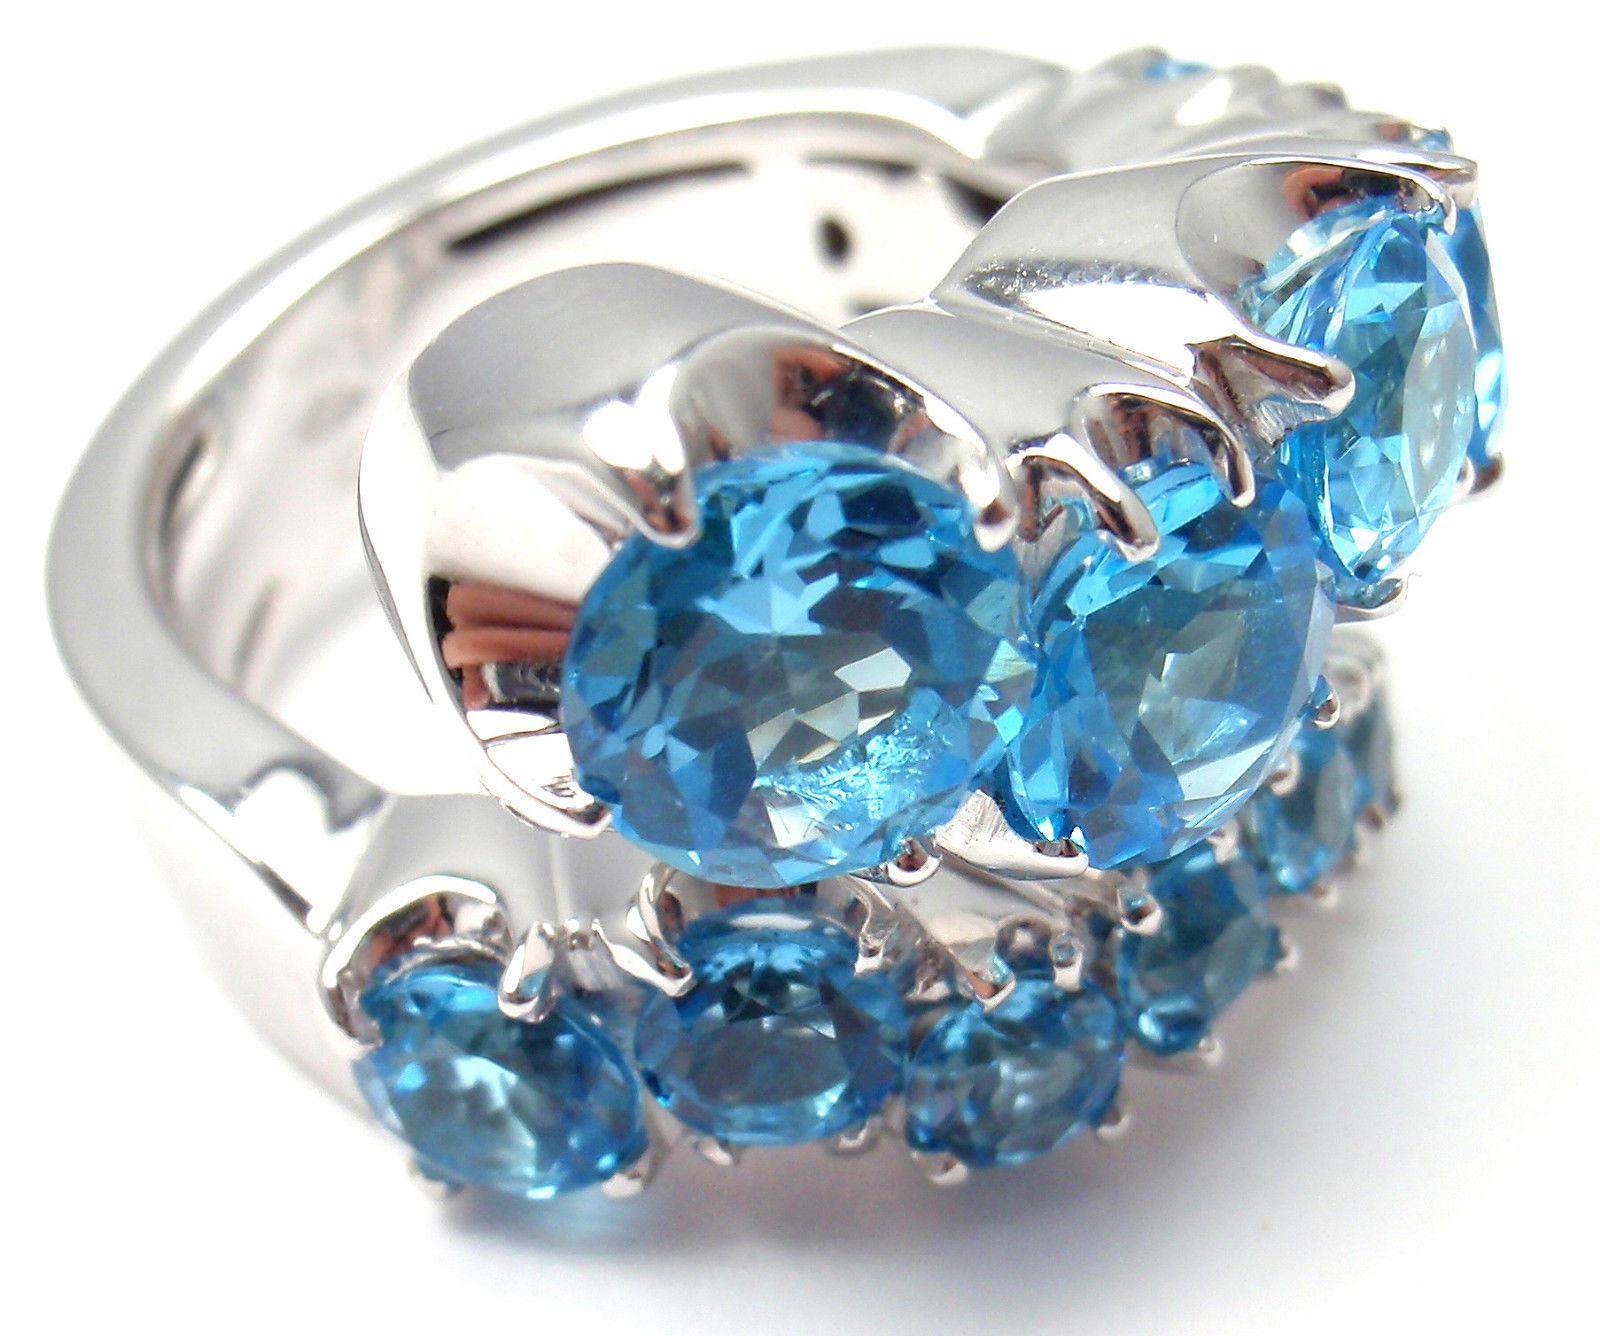 """""Pasquale Bruni Sun Ray 18K White Gold Diamond and Blue Topaz Ring"""""" 273948"